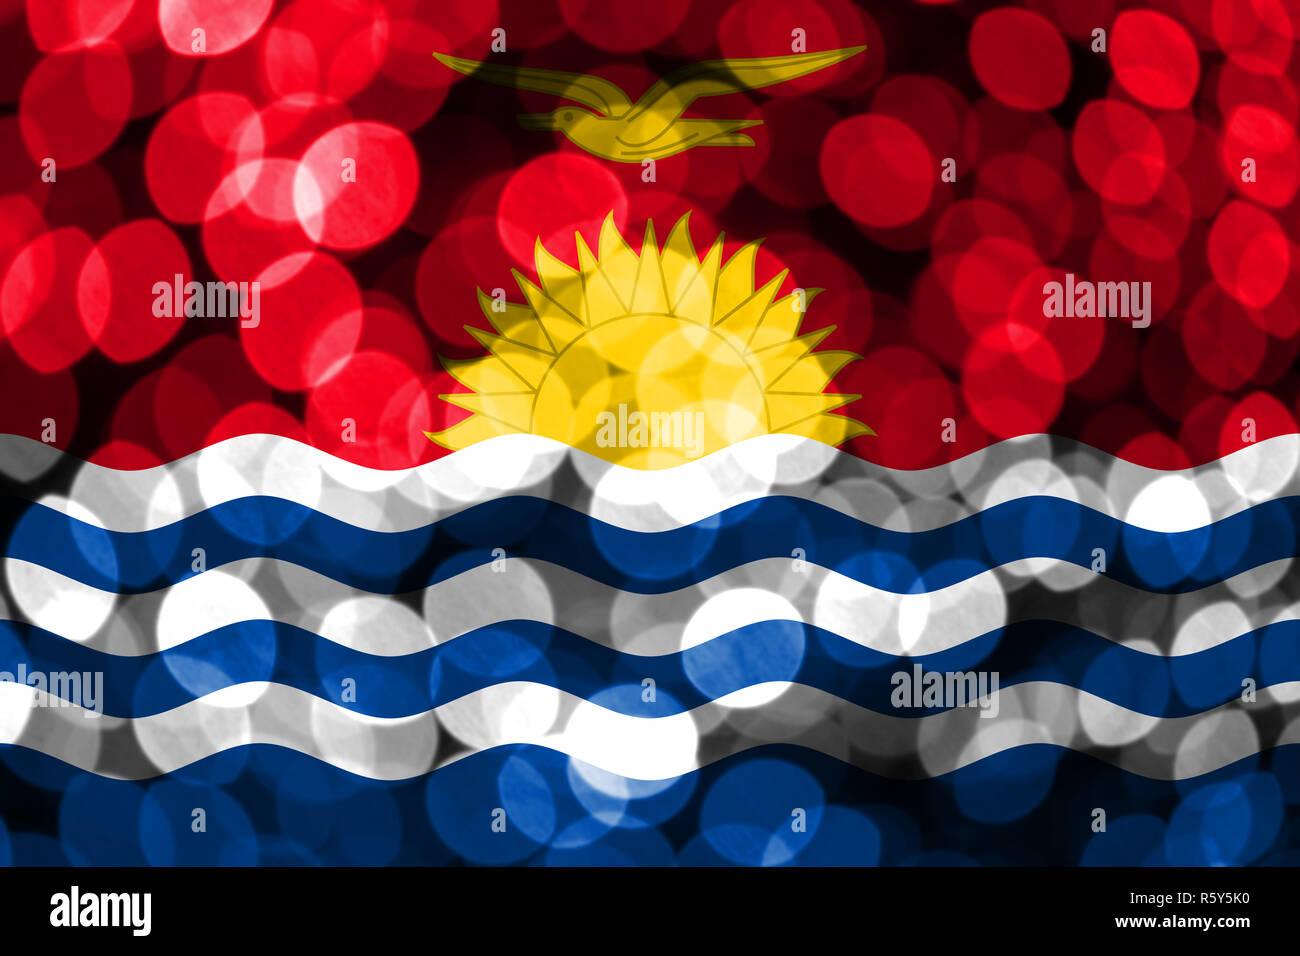 Kiribati abstract blurry bokeh flag. Christmas, New Year and National day concept flag. Stock Photo